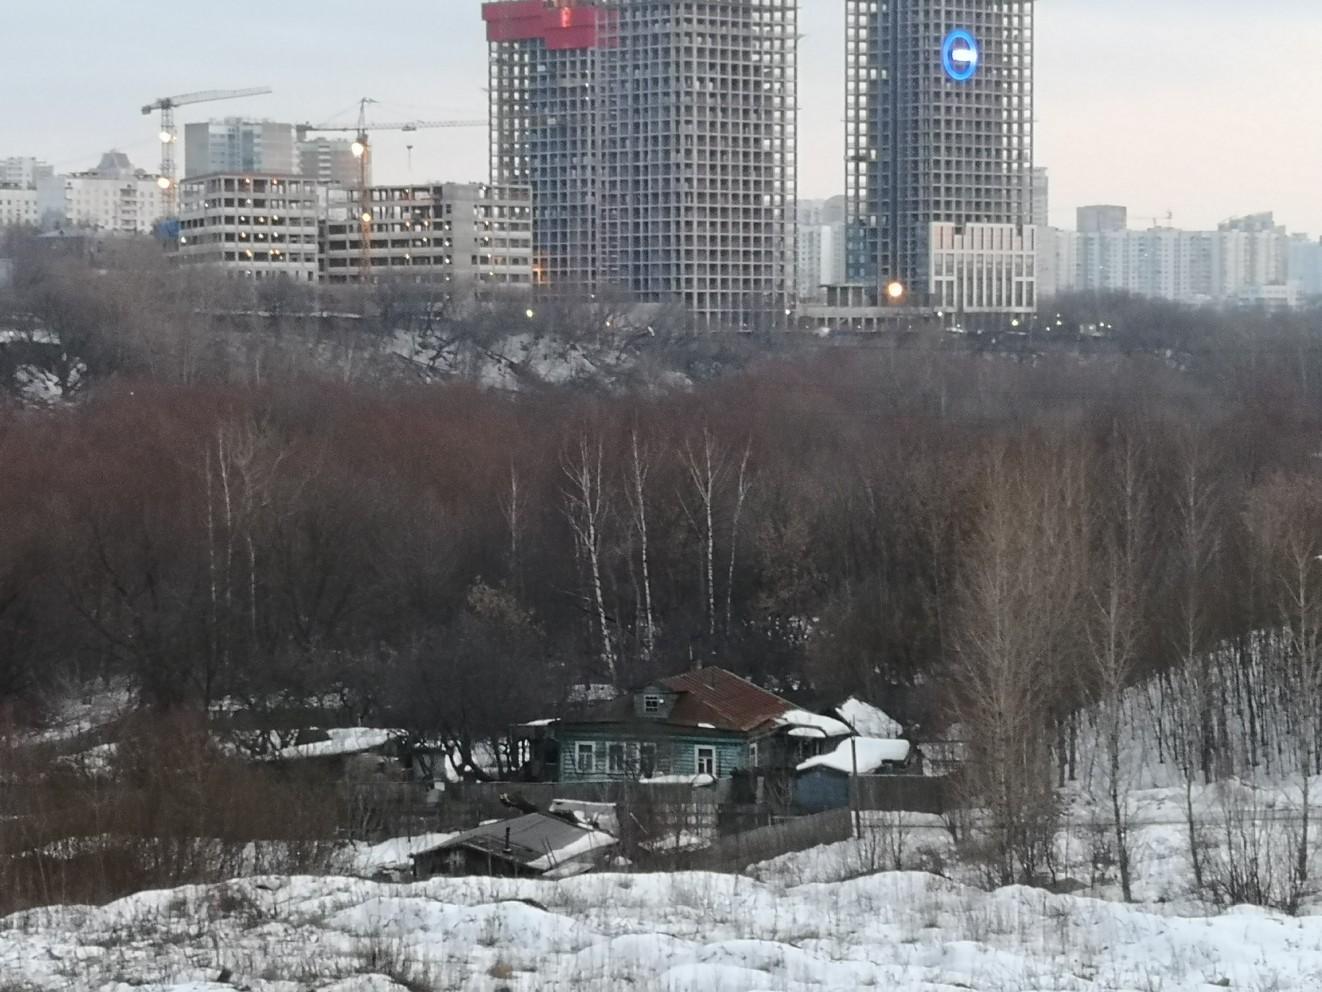 2019 Последний дом деревни Матвеевское. Александр Александров